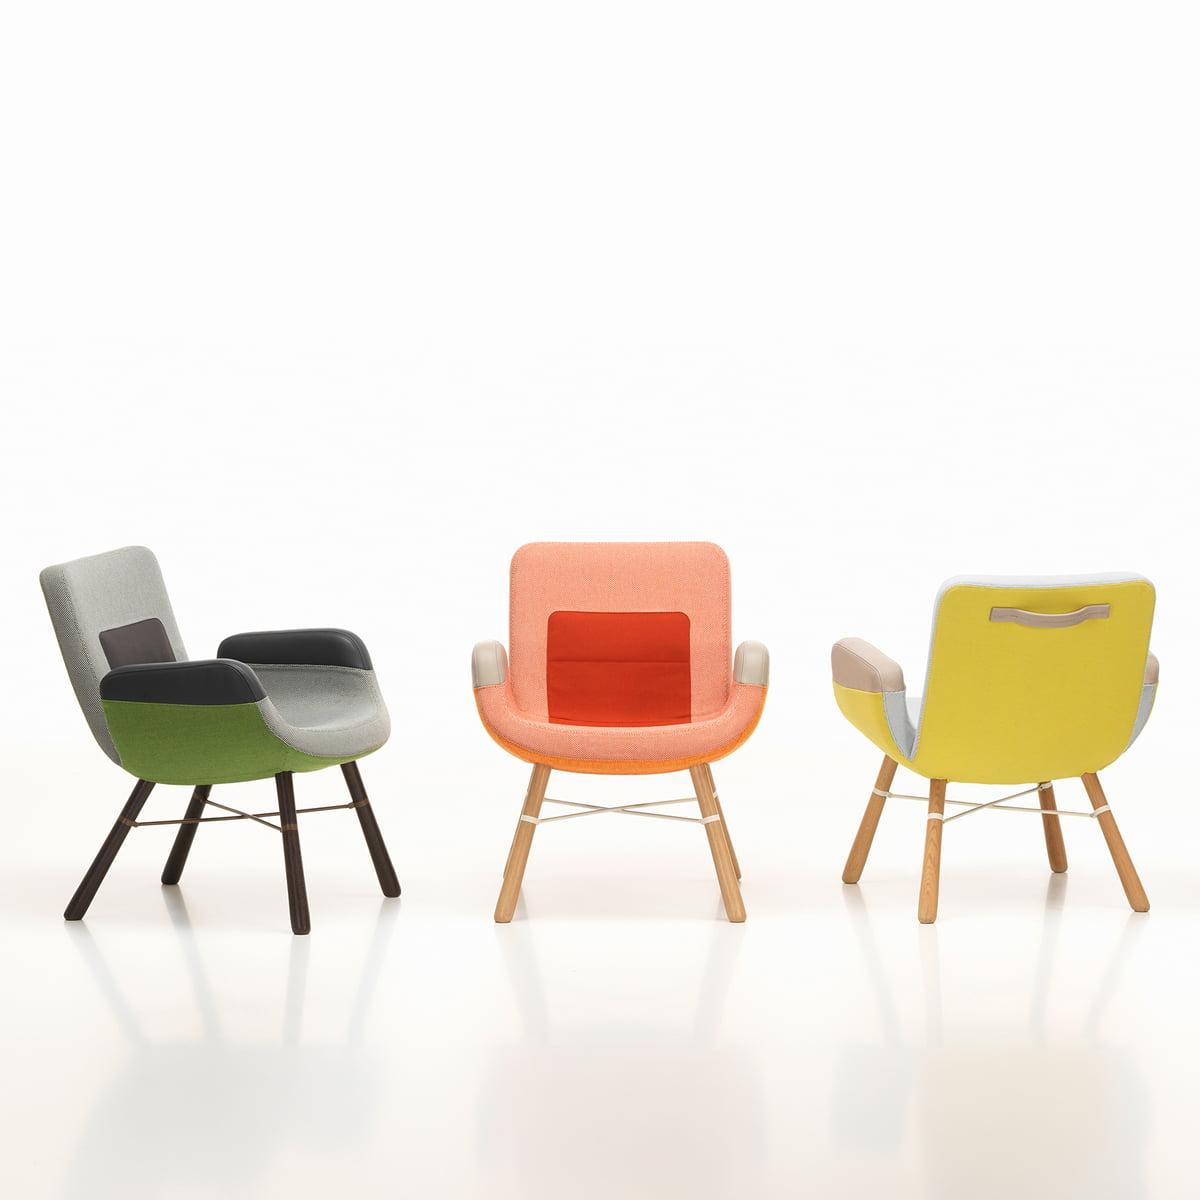 east river chair von vitra im wohndesign shop. Black Bedroom Furniture Sets. Home Design Ideas